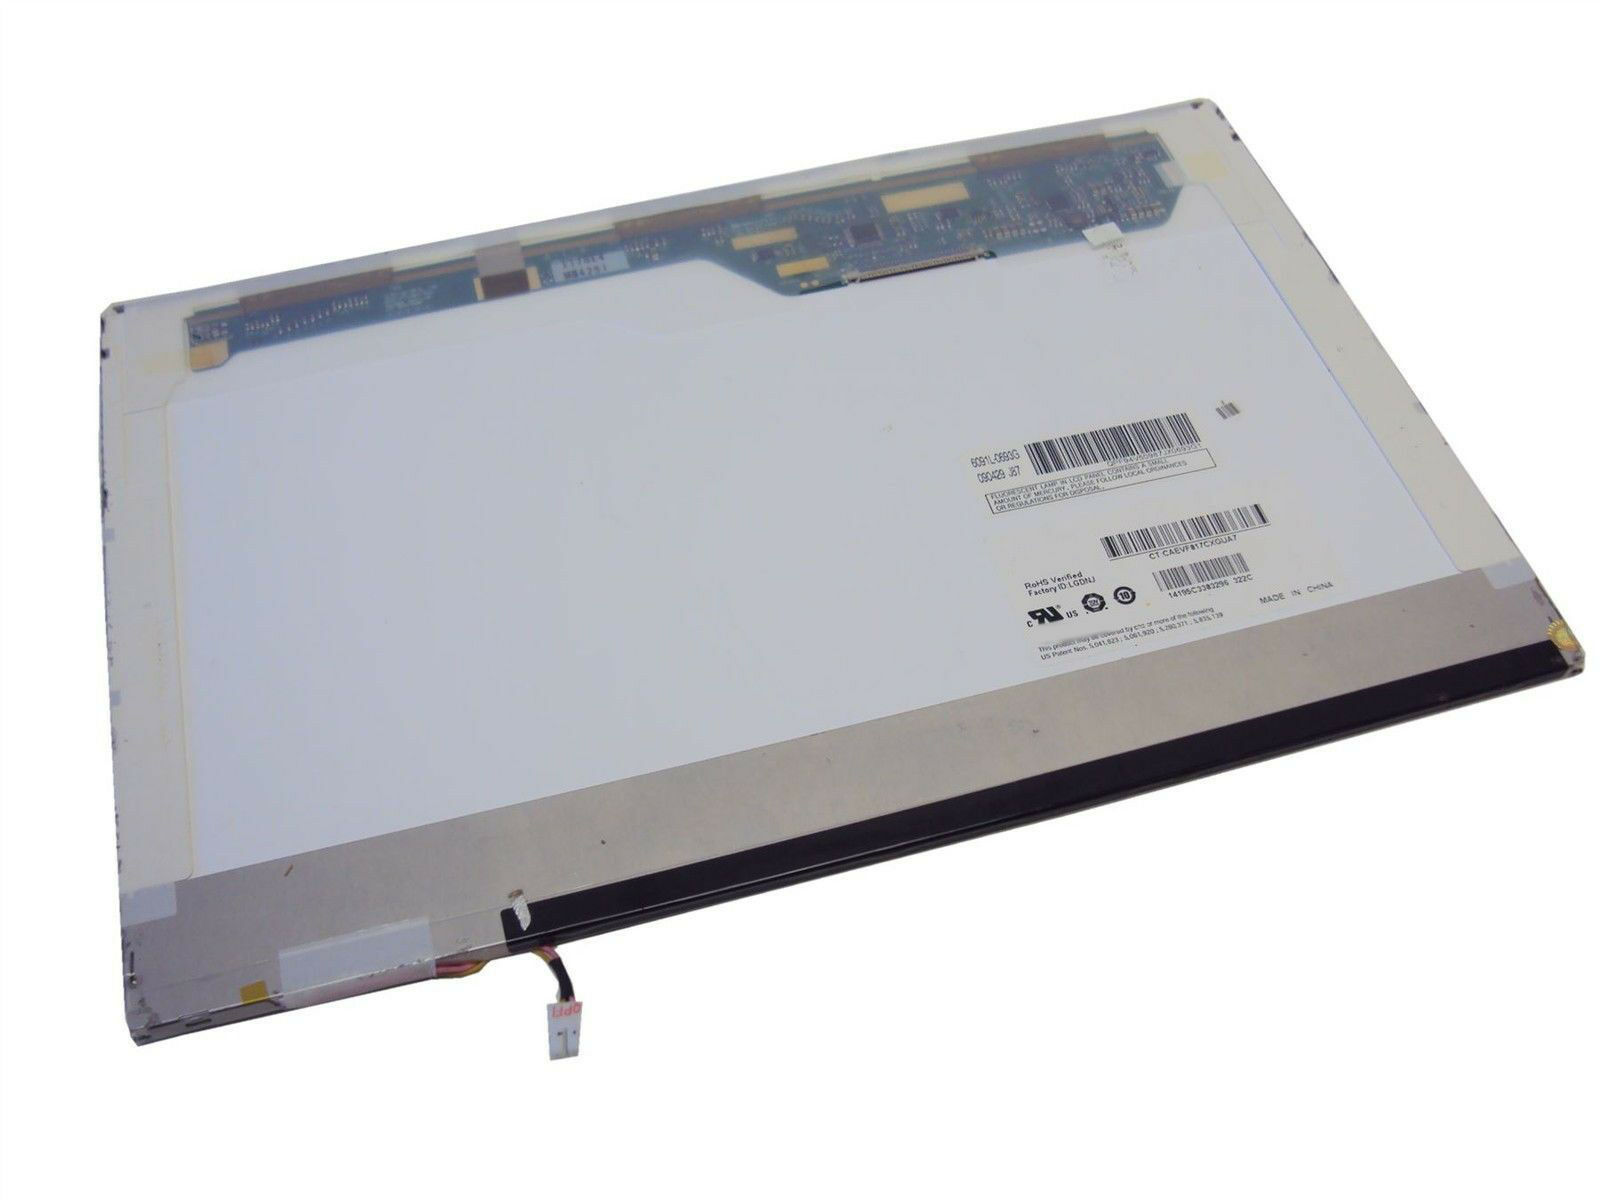 *BN* QD14TL01 14 INCH WIDE COMPATIBLE LCD SCREEN